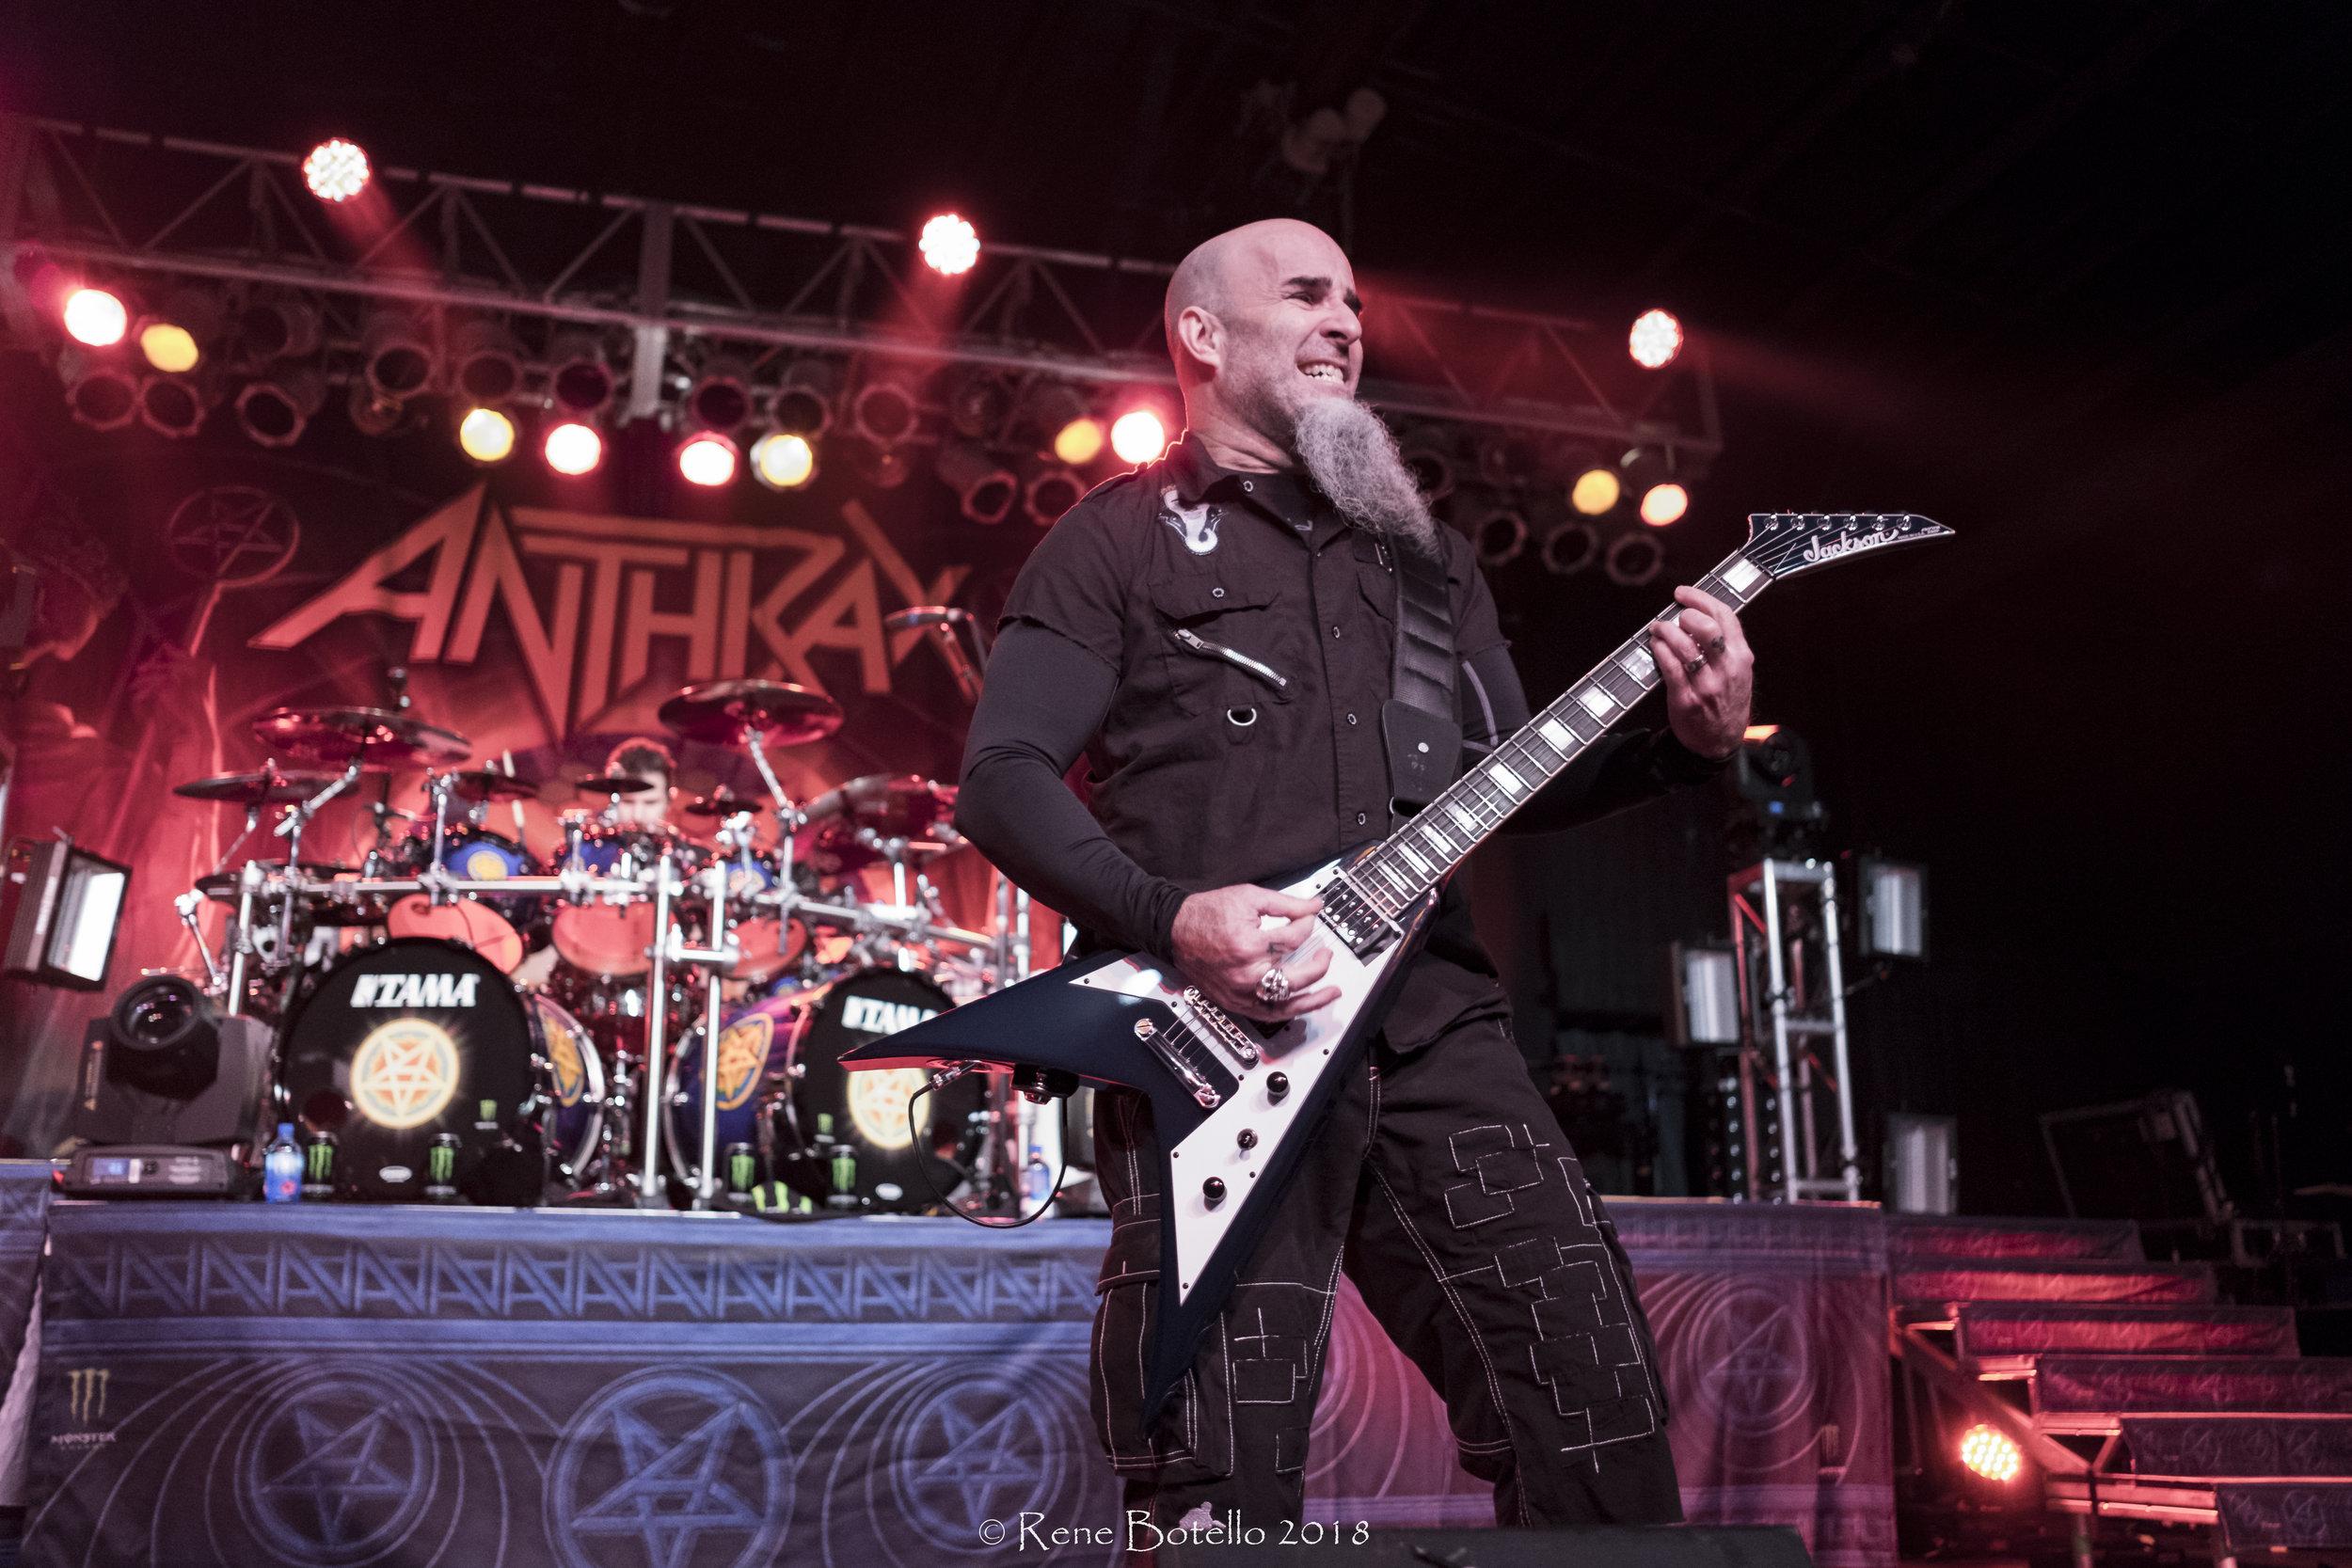 Anthrax Feb 8 2018-4-2.jpg